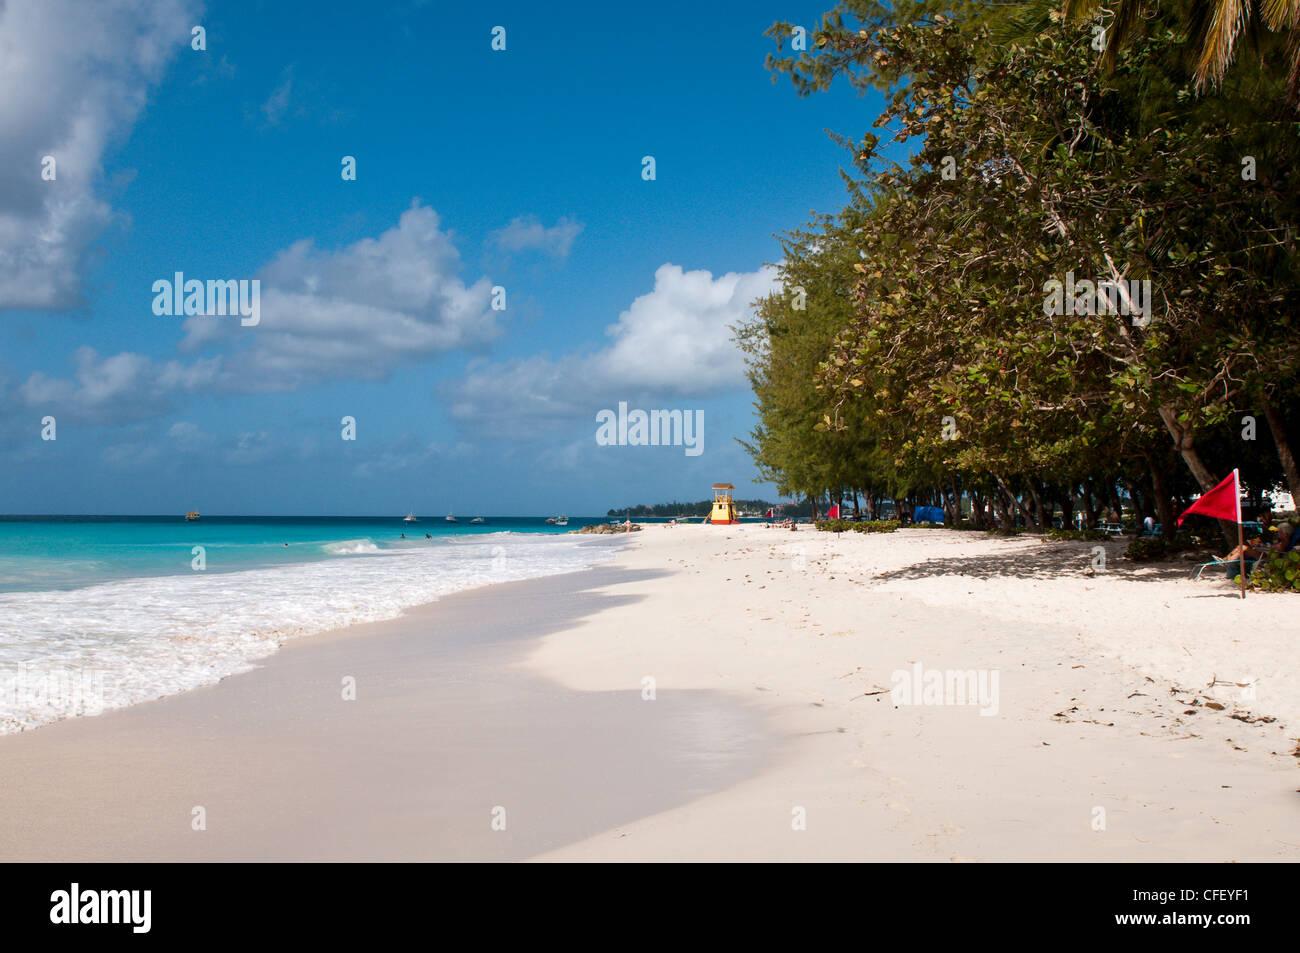 Miami Beach, Barbados, Islas de Barlovento, Antillas, Caribe, América Central Imagen De Stock